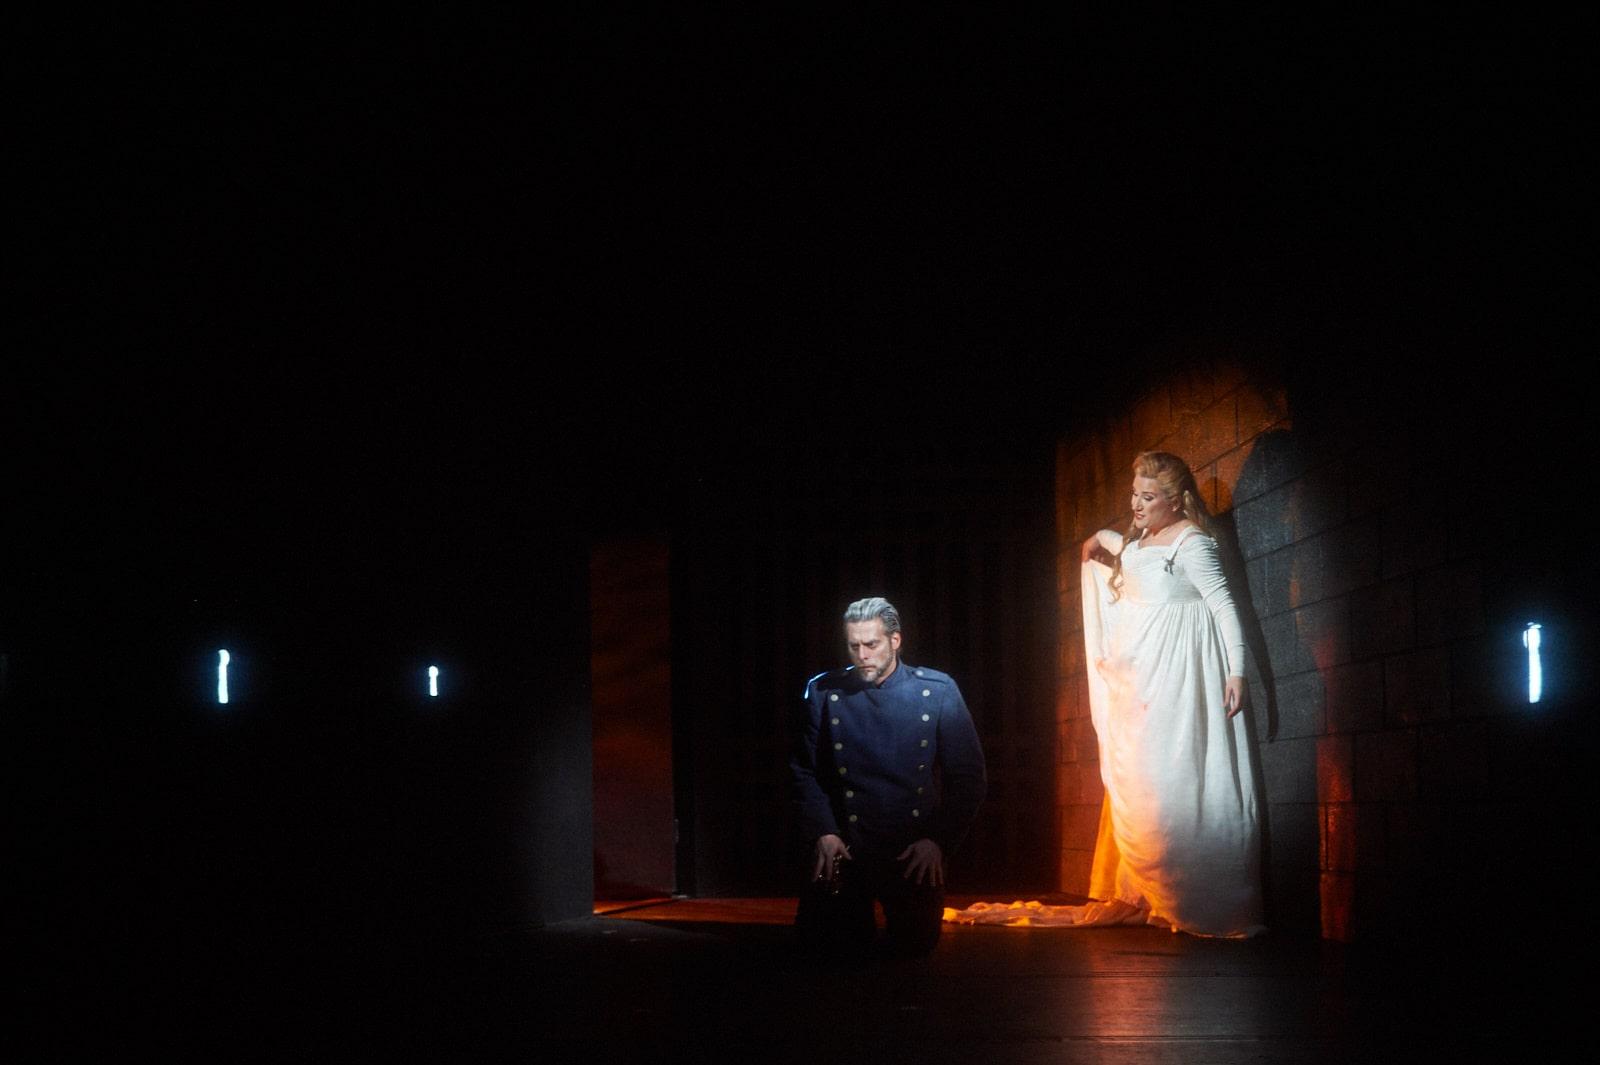 Bride stands spot lit against brick wall with blue uniformed man kneeling beside, keyhole lights piercing the darkness.